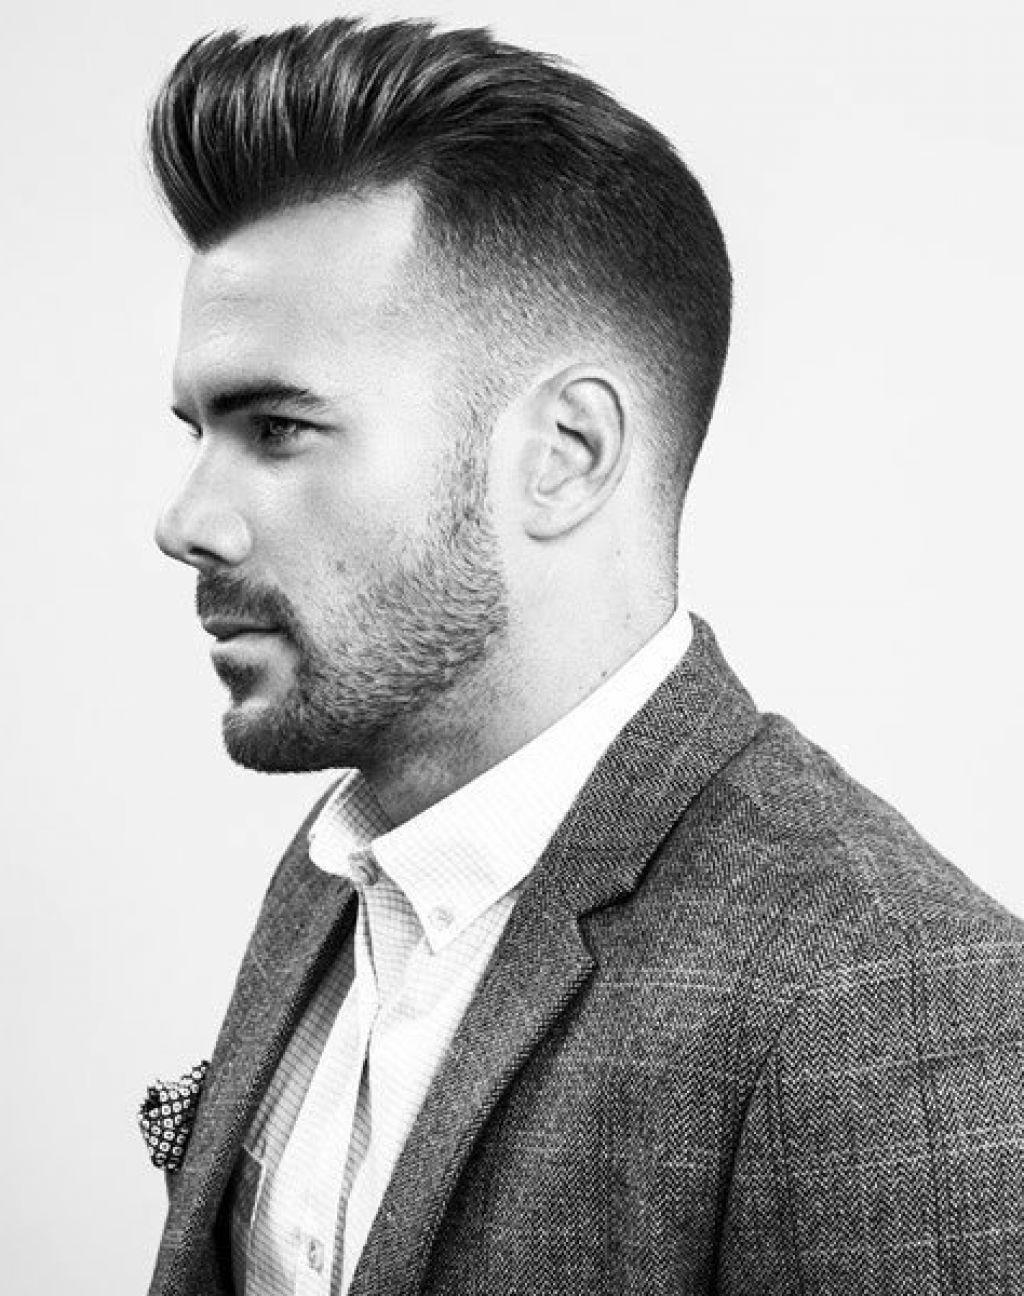 Various pompadour hairstyle men hair hairstyle haircut